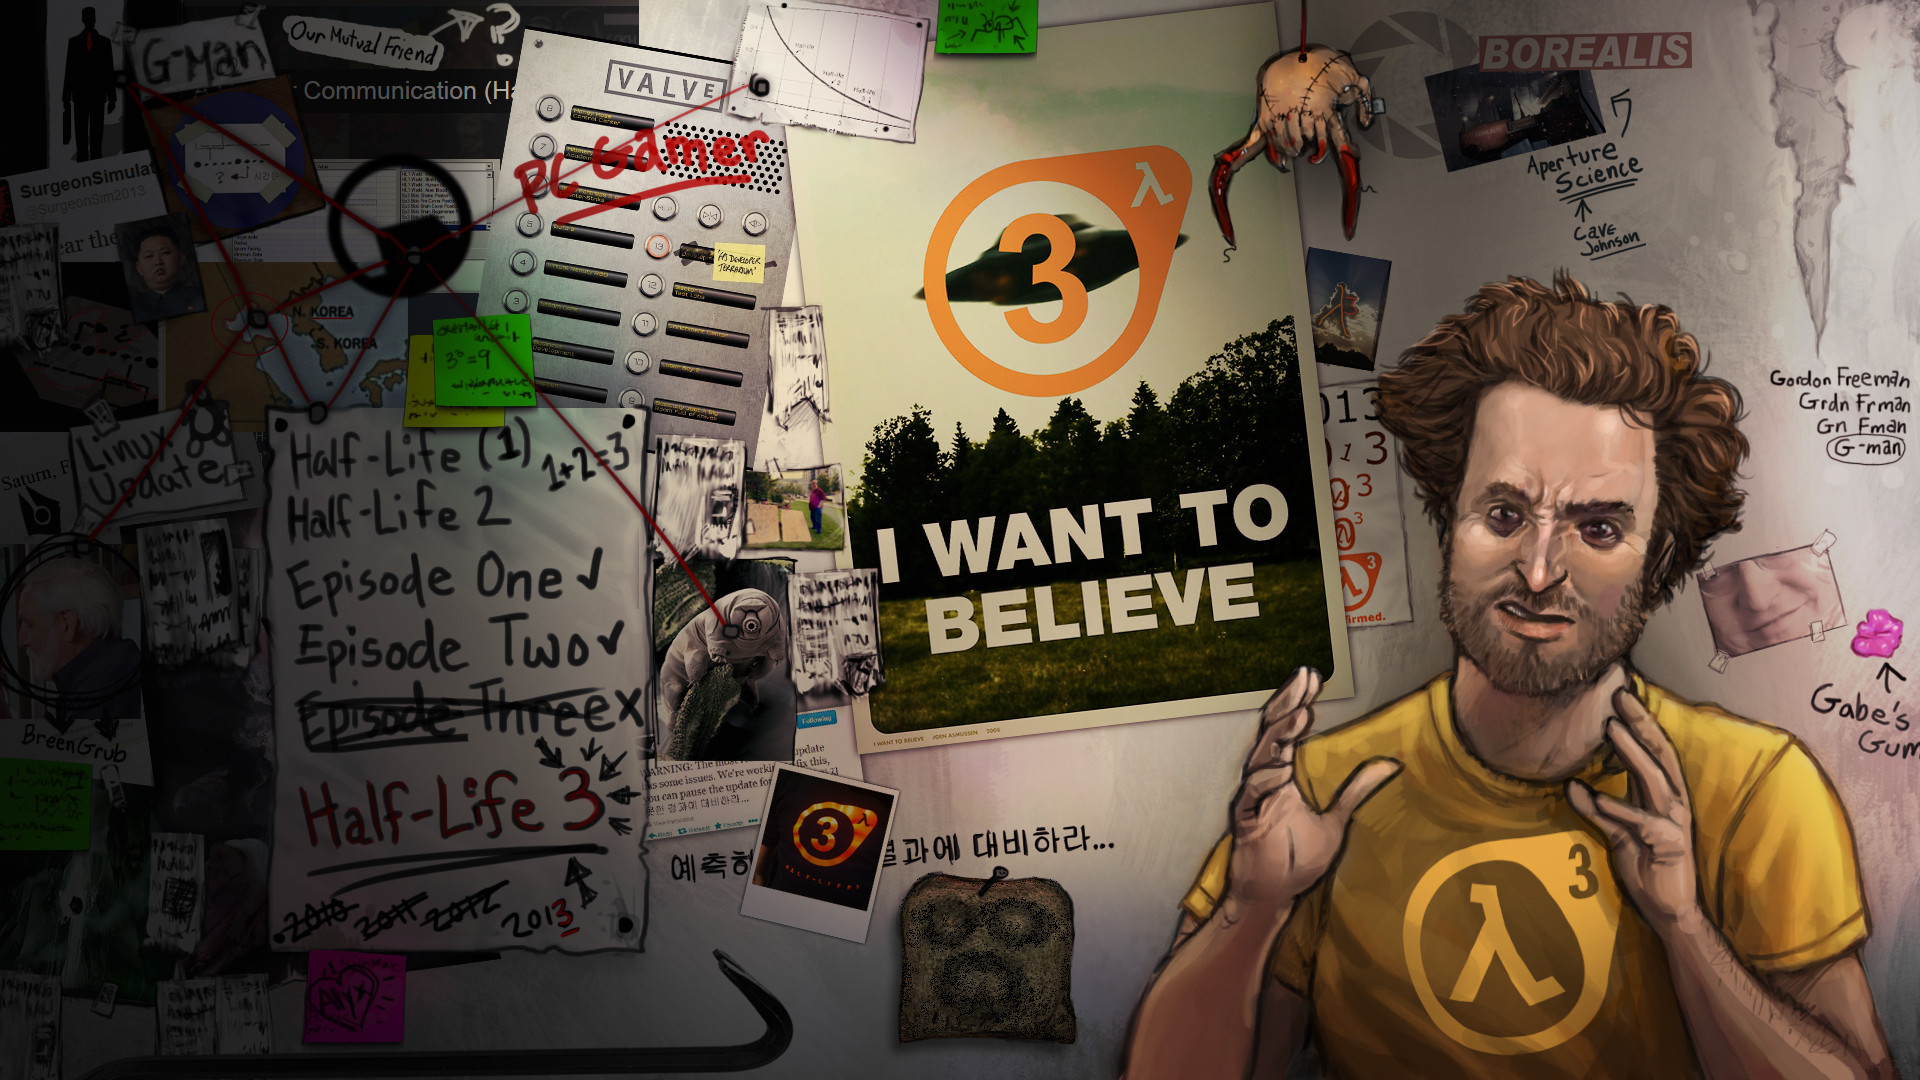 Half-Life 3 game